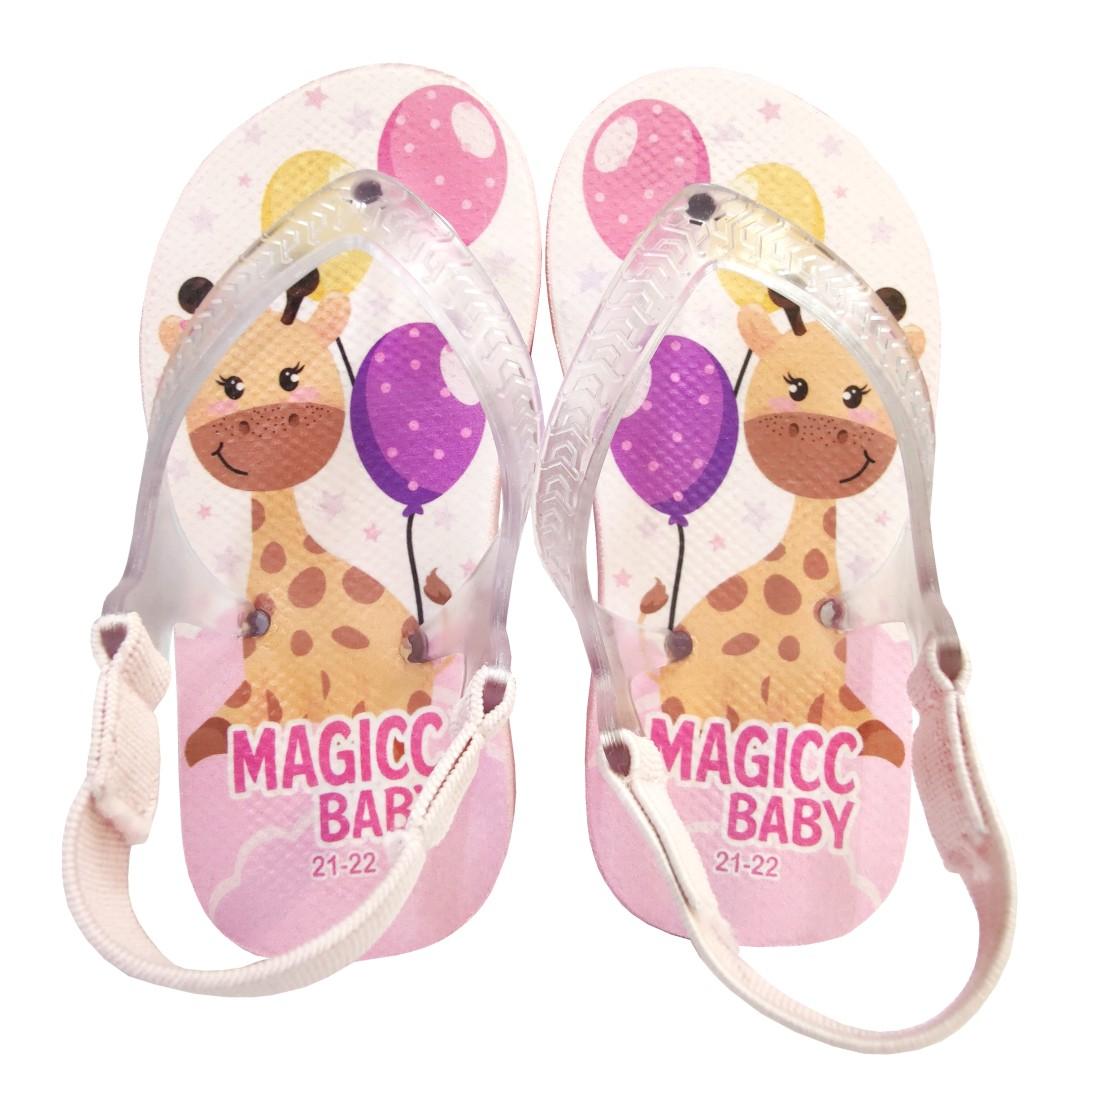 Chinelo Menina Bebê Sandália Girafinha Magicc Baby